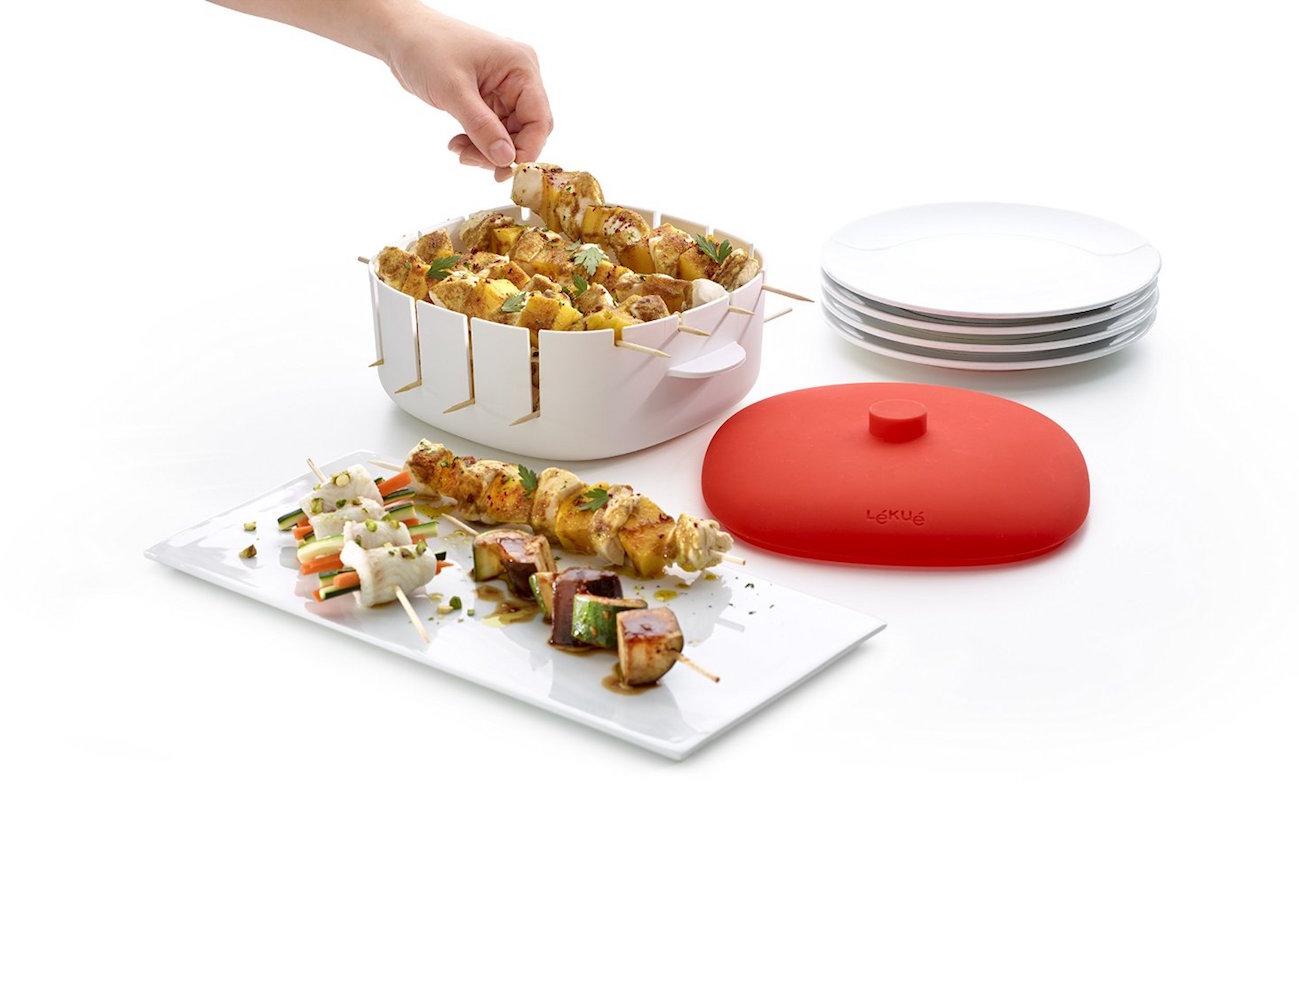 Lékué Microwavable Kebob Cooker